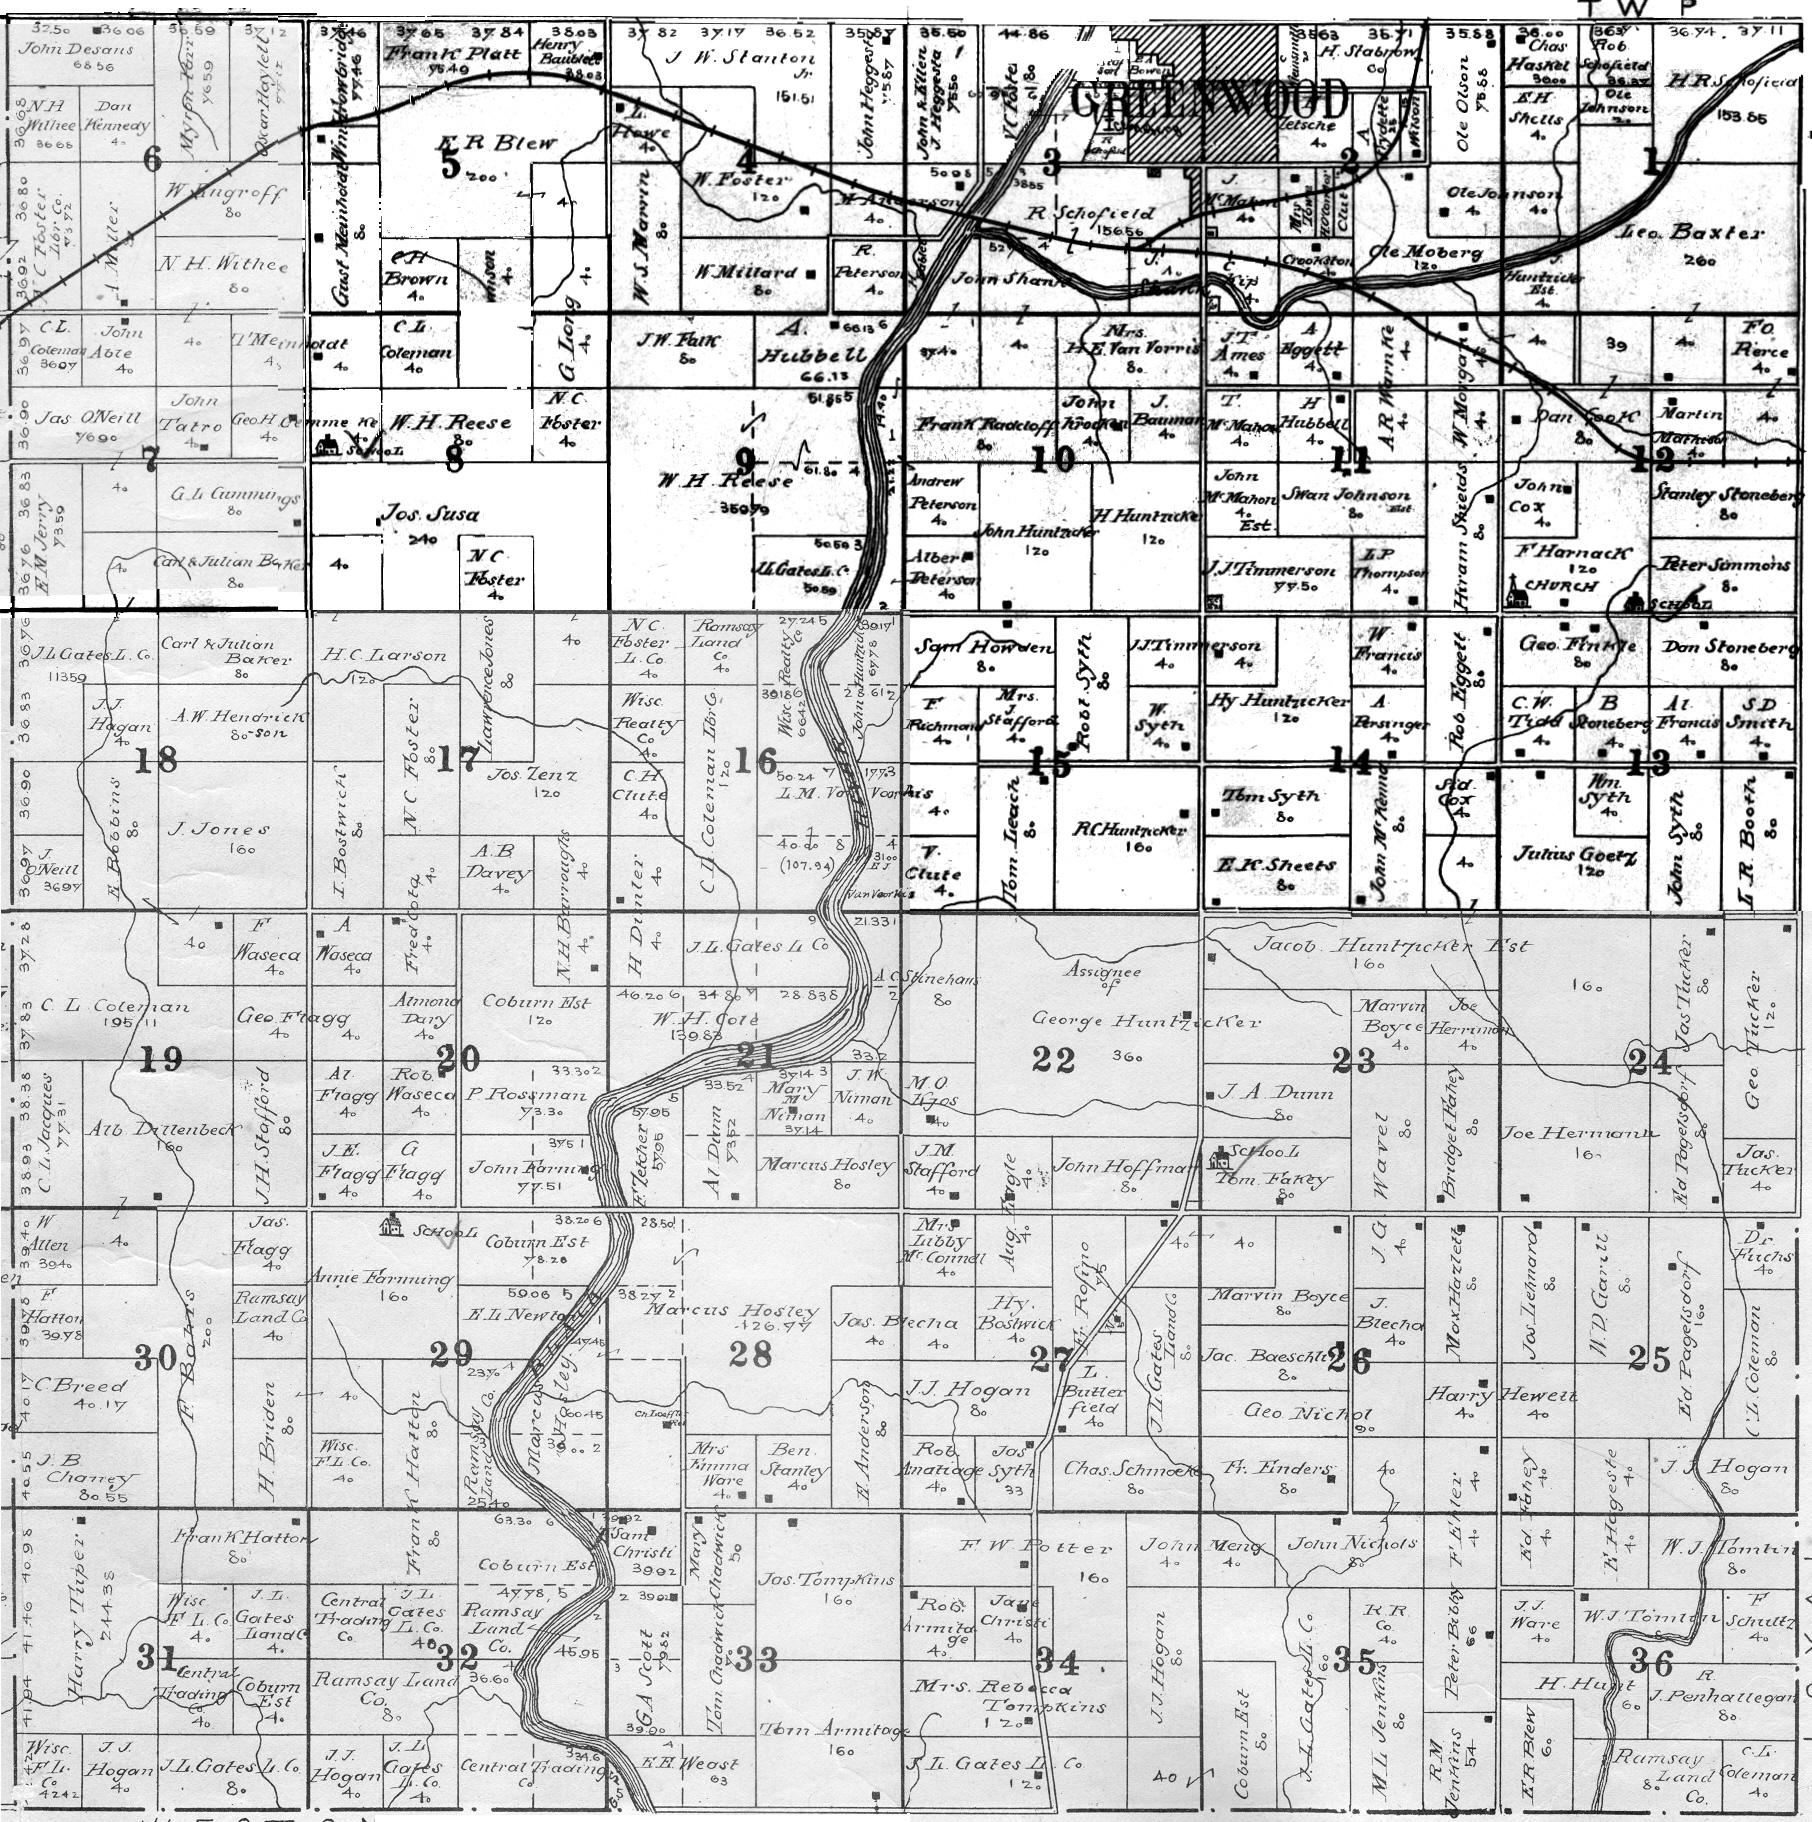 Warren County Property Maps